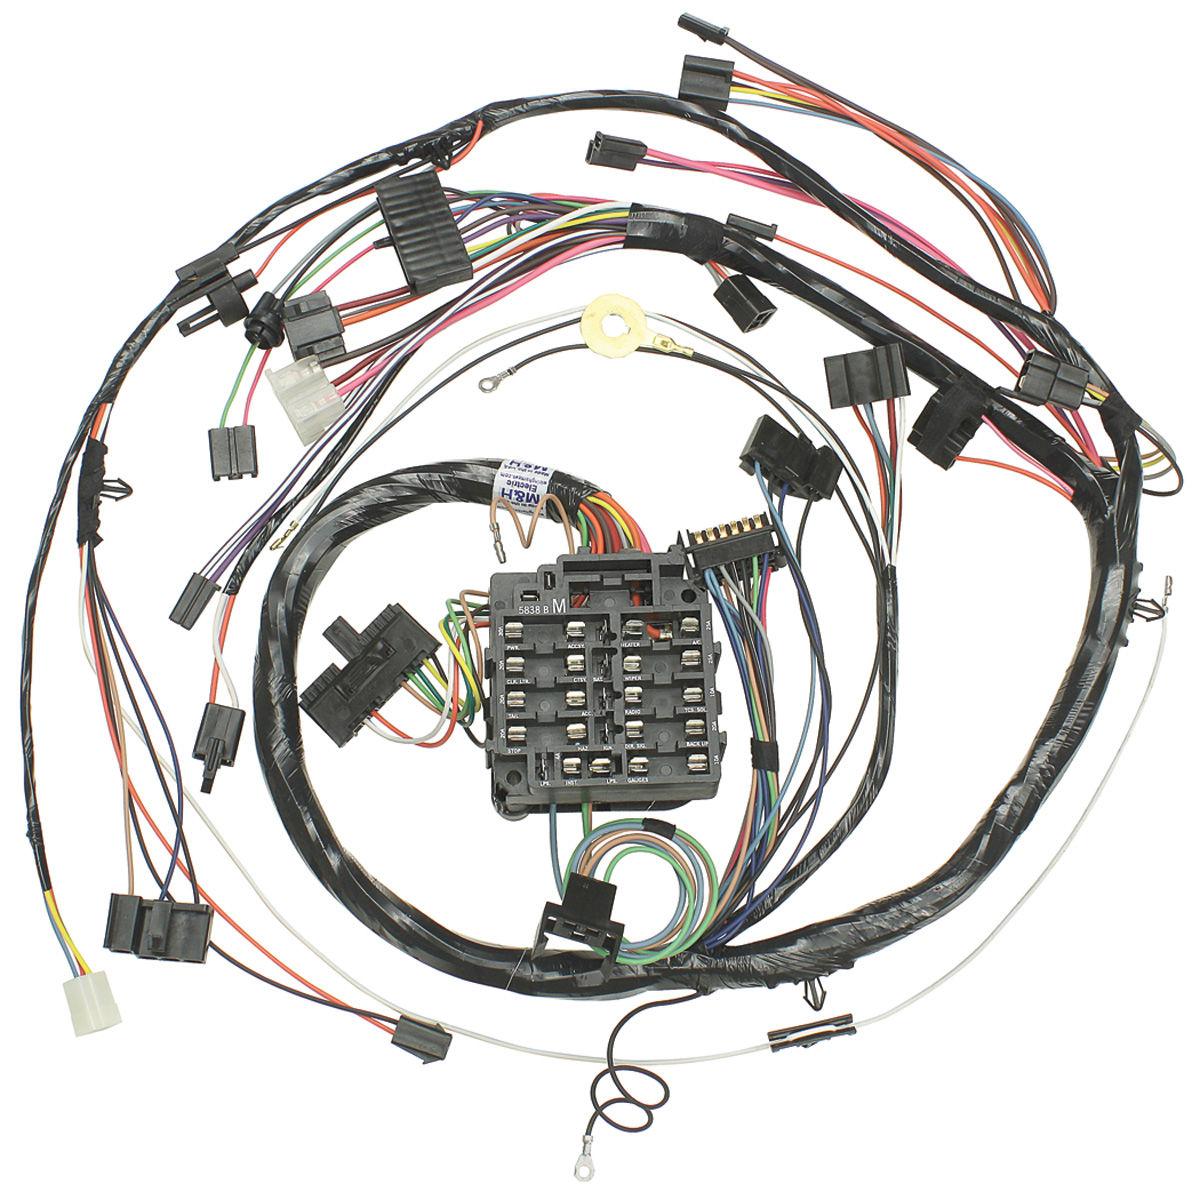 m h 1972 monte carlo dash instrument panel harness round gauge type with ss gauges. Black Bedroom Furniture Sets. Home Design Ideas